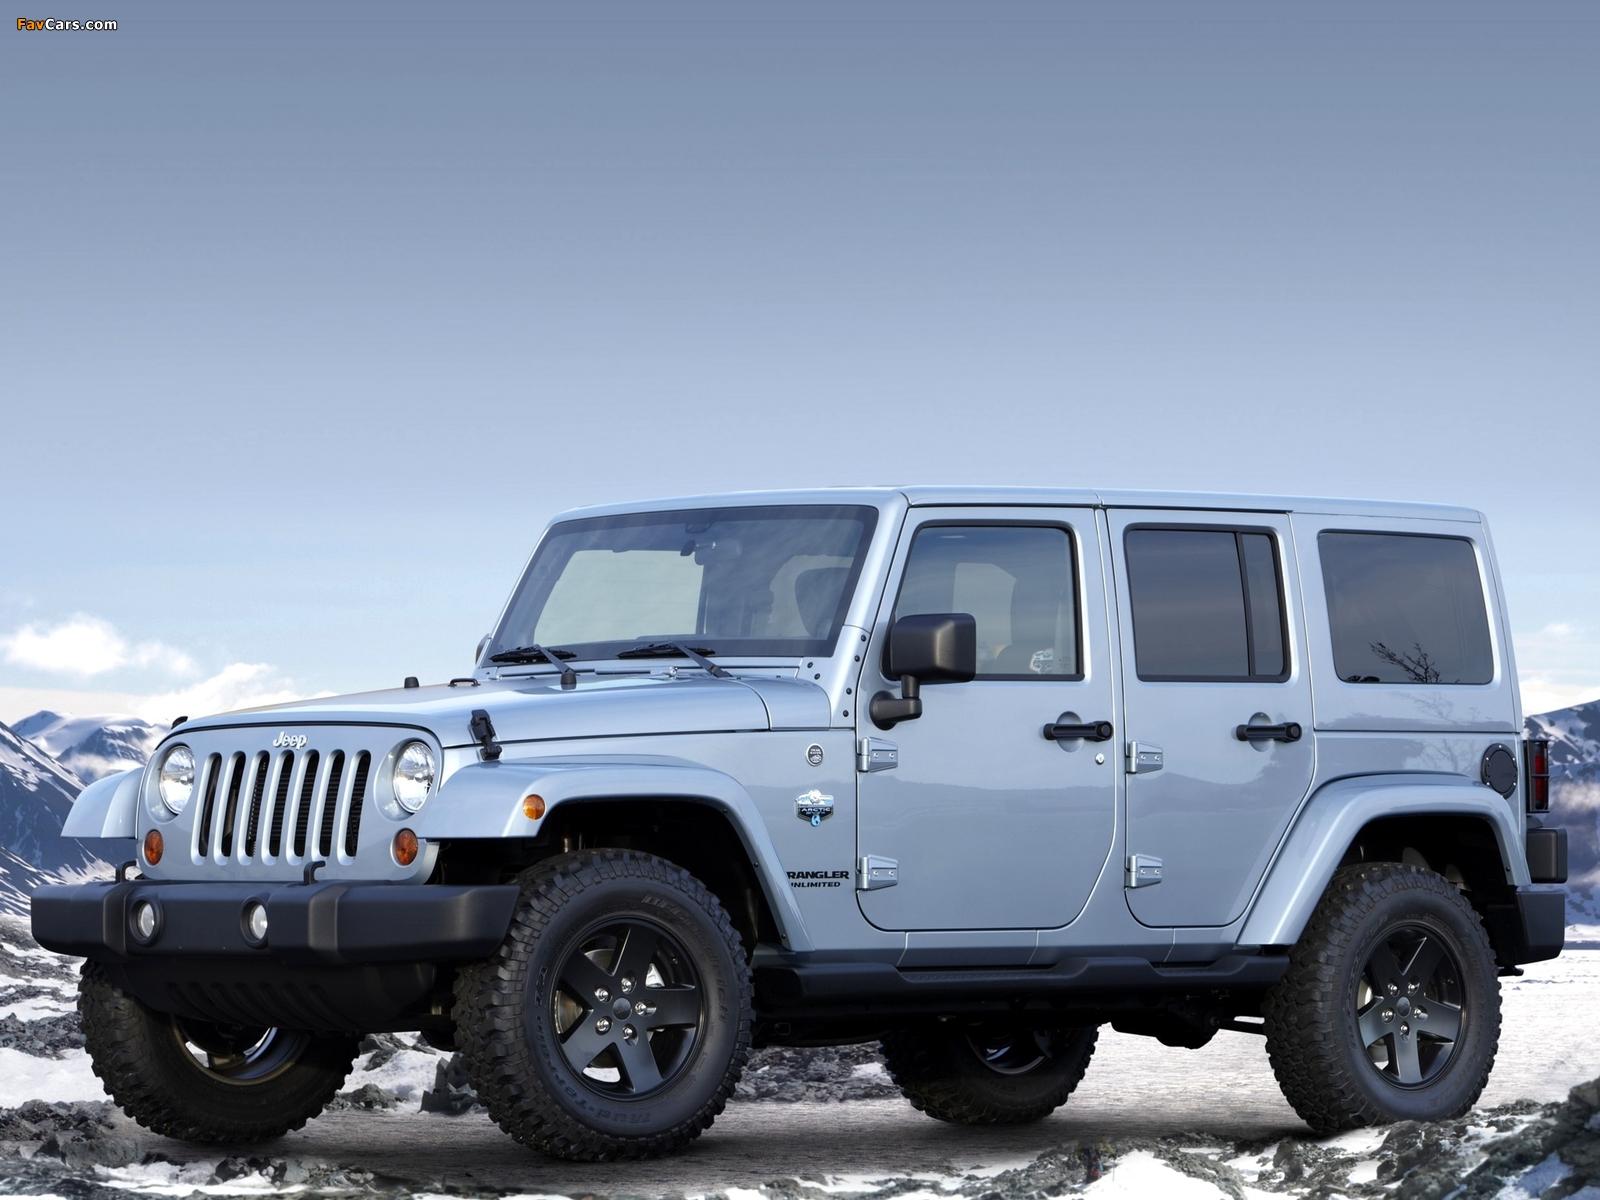 Jeep Wrangler Unlimited Arctic (JK) 2012 photos (1600 x 1200)